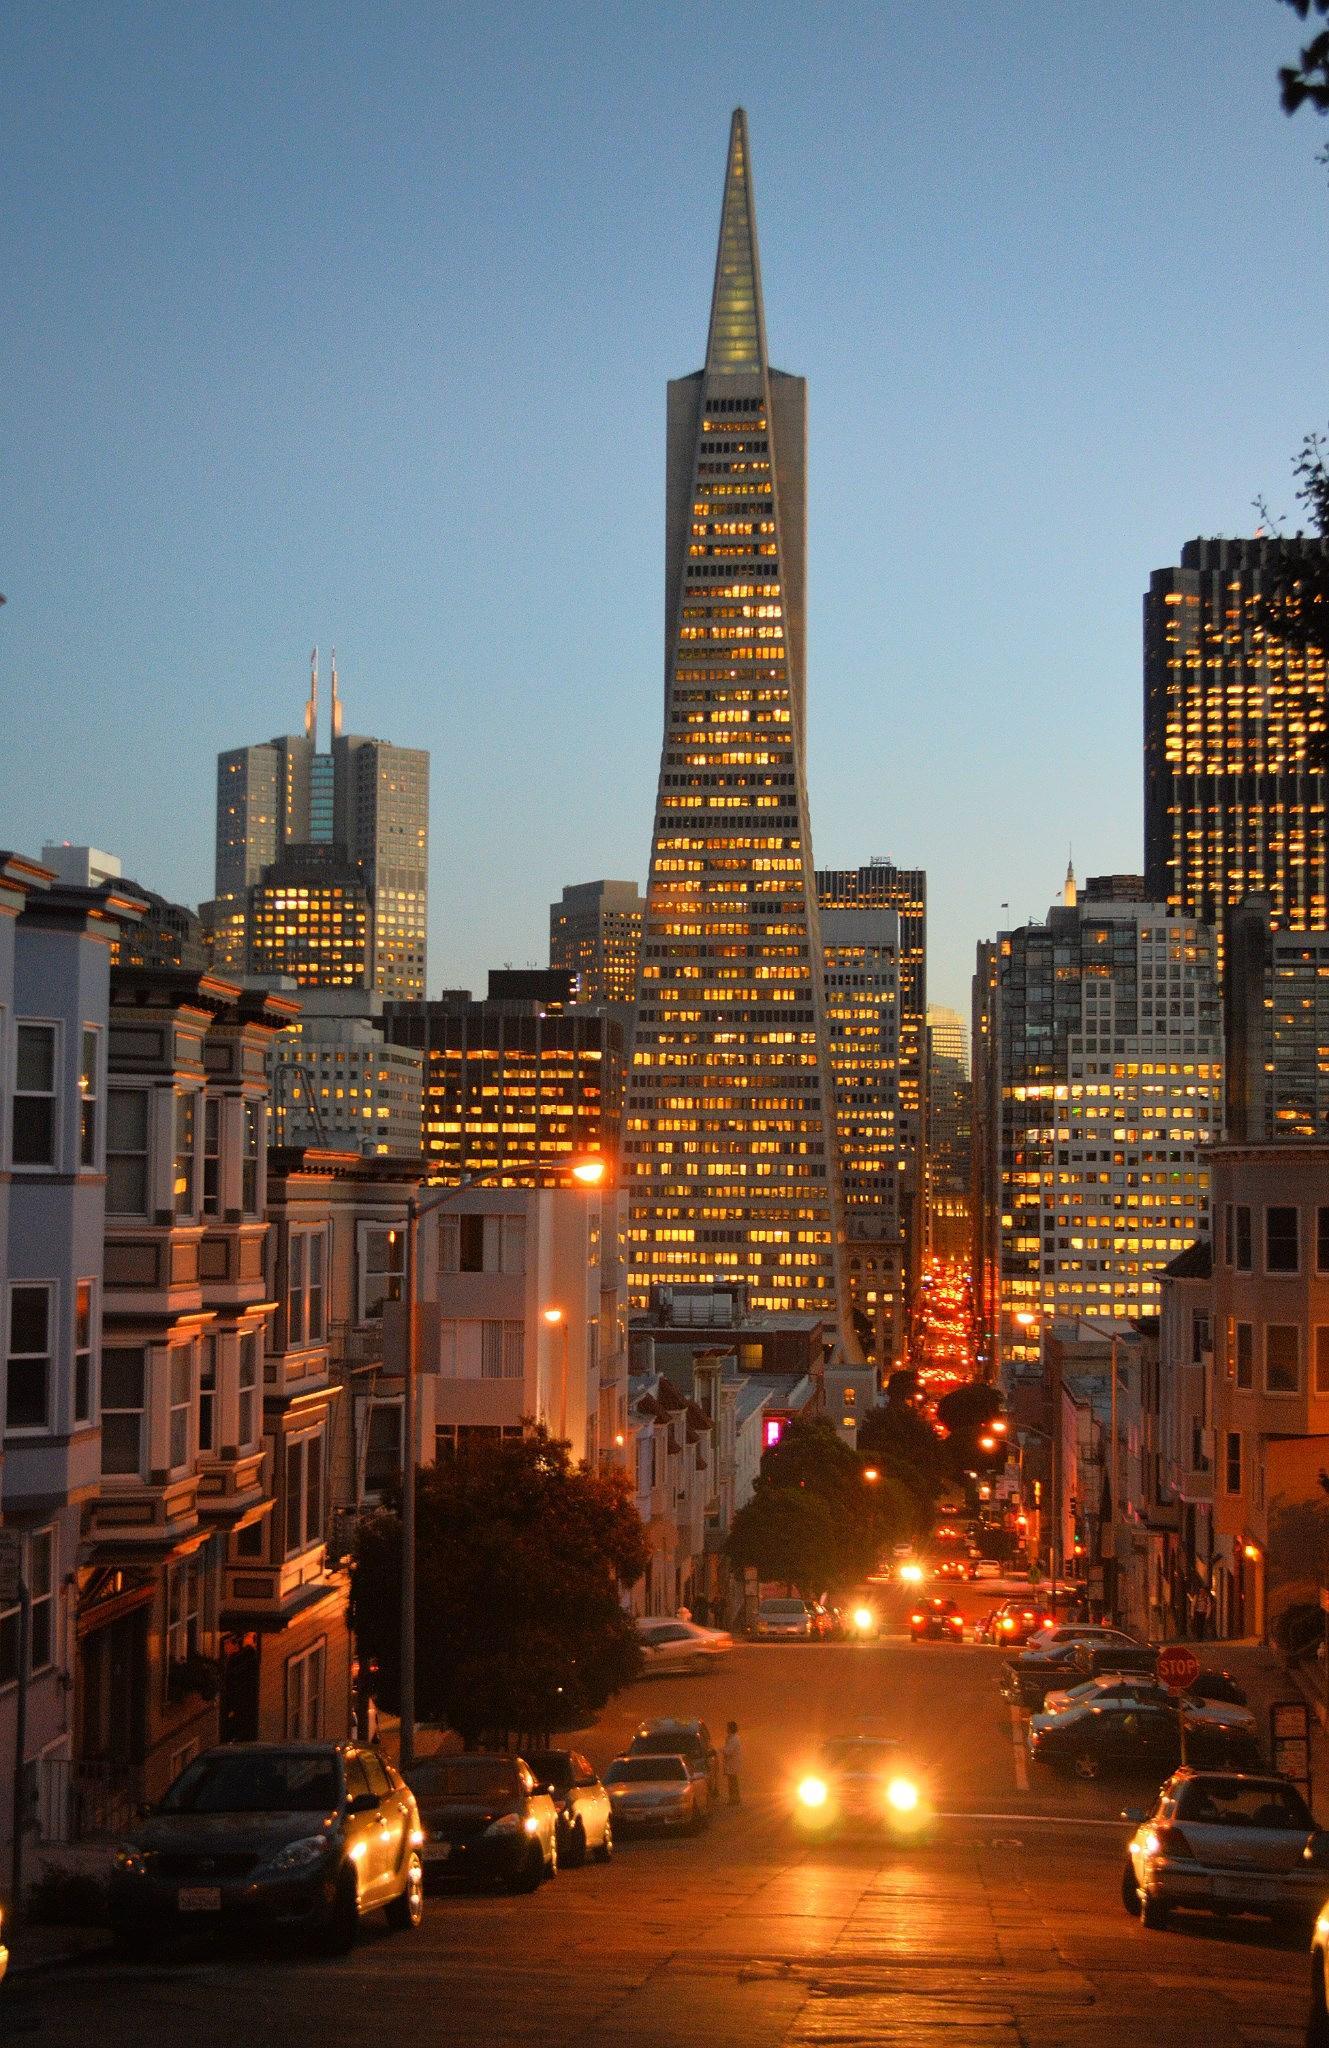 Downtown San Francisco at night by Frederico Domondon